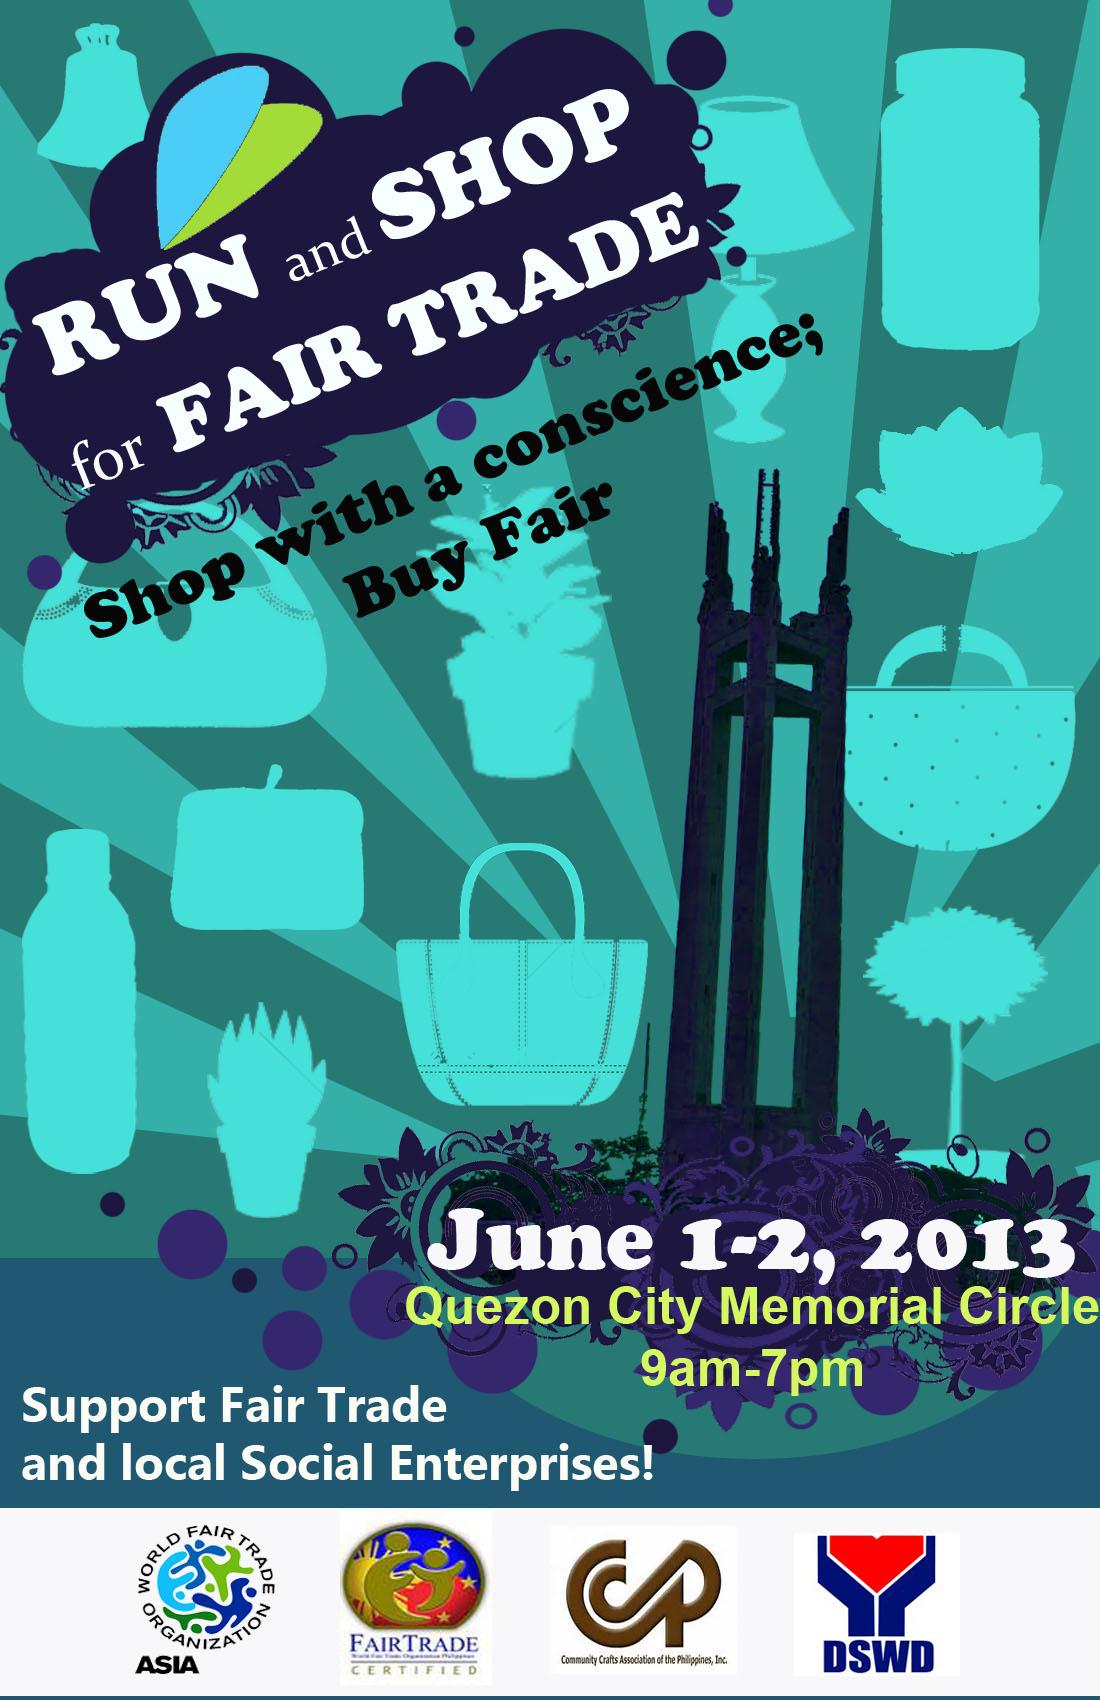 run-and-shop-for-fair-trade-2013-poster